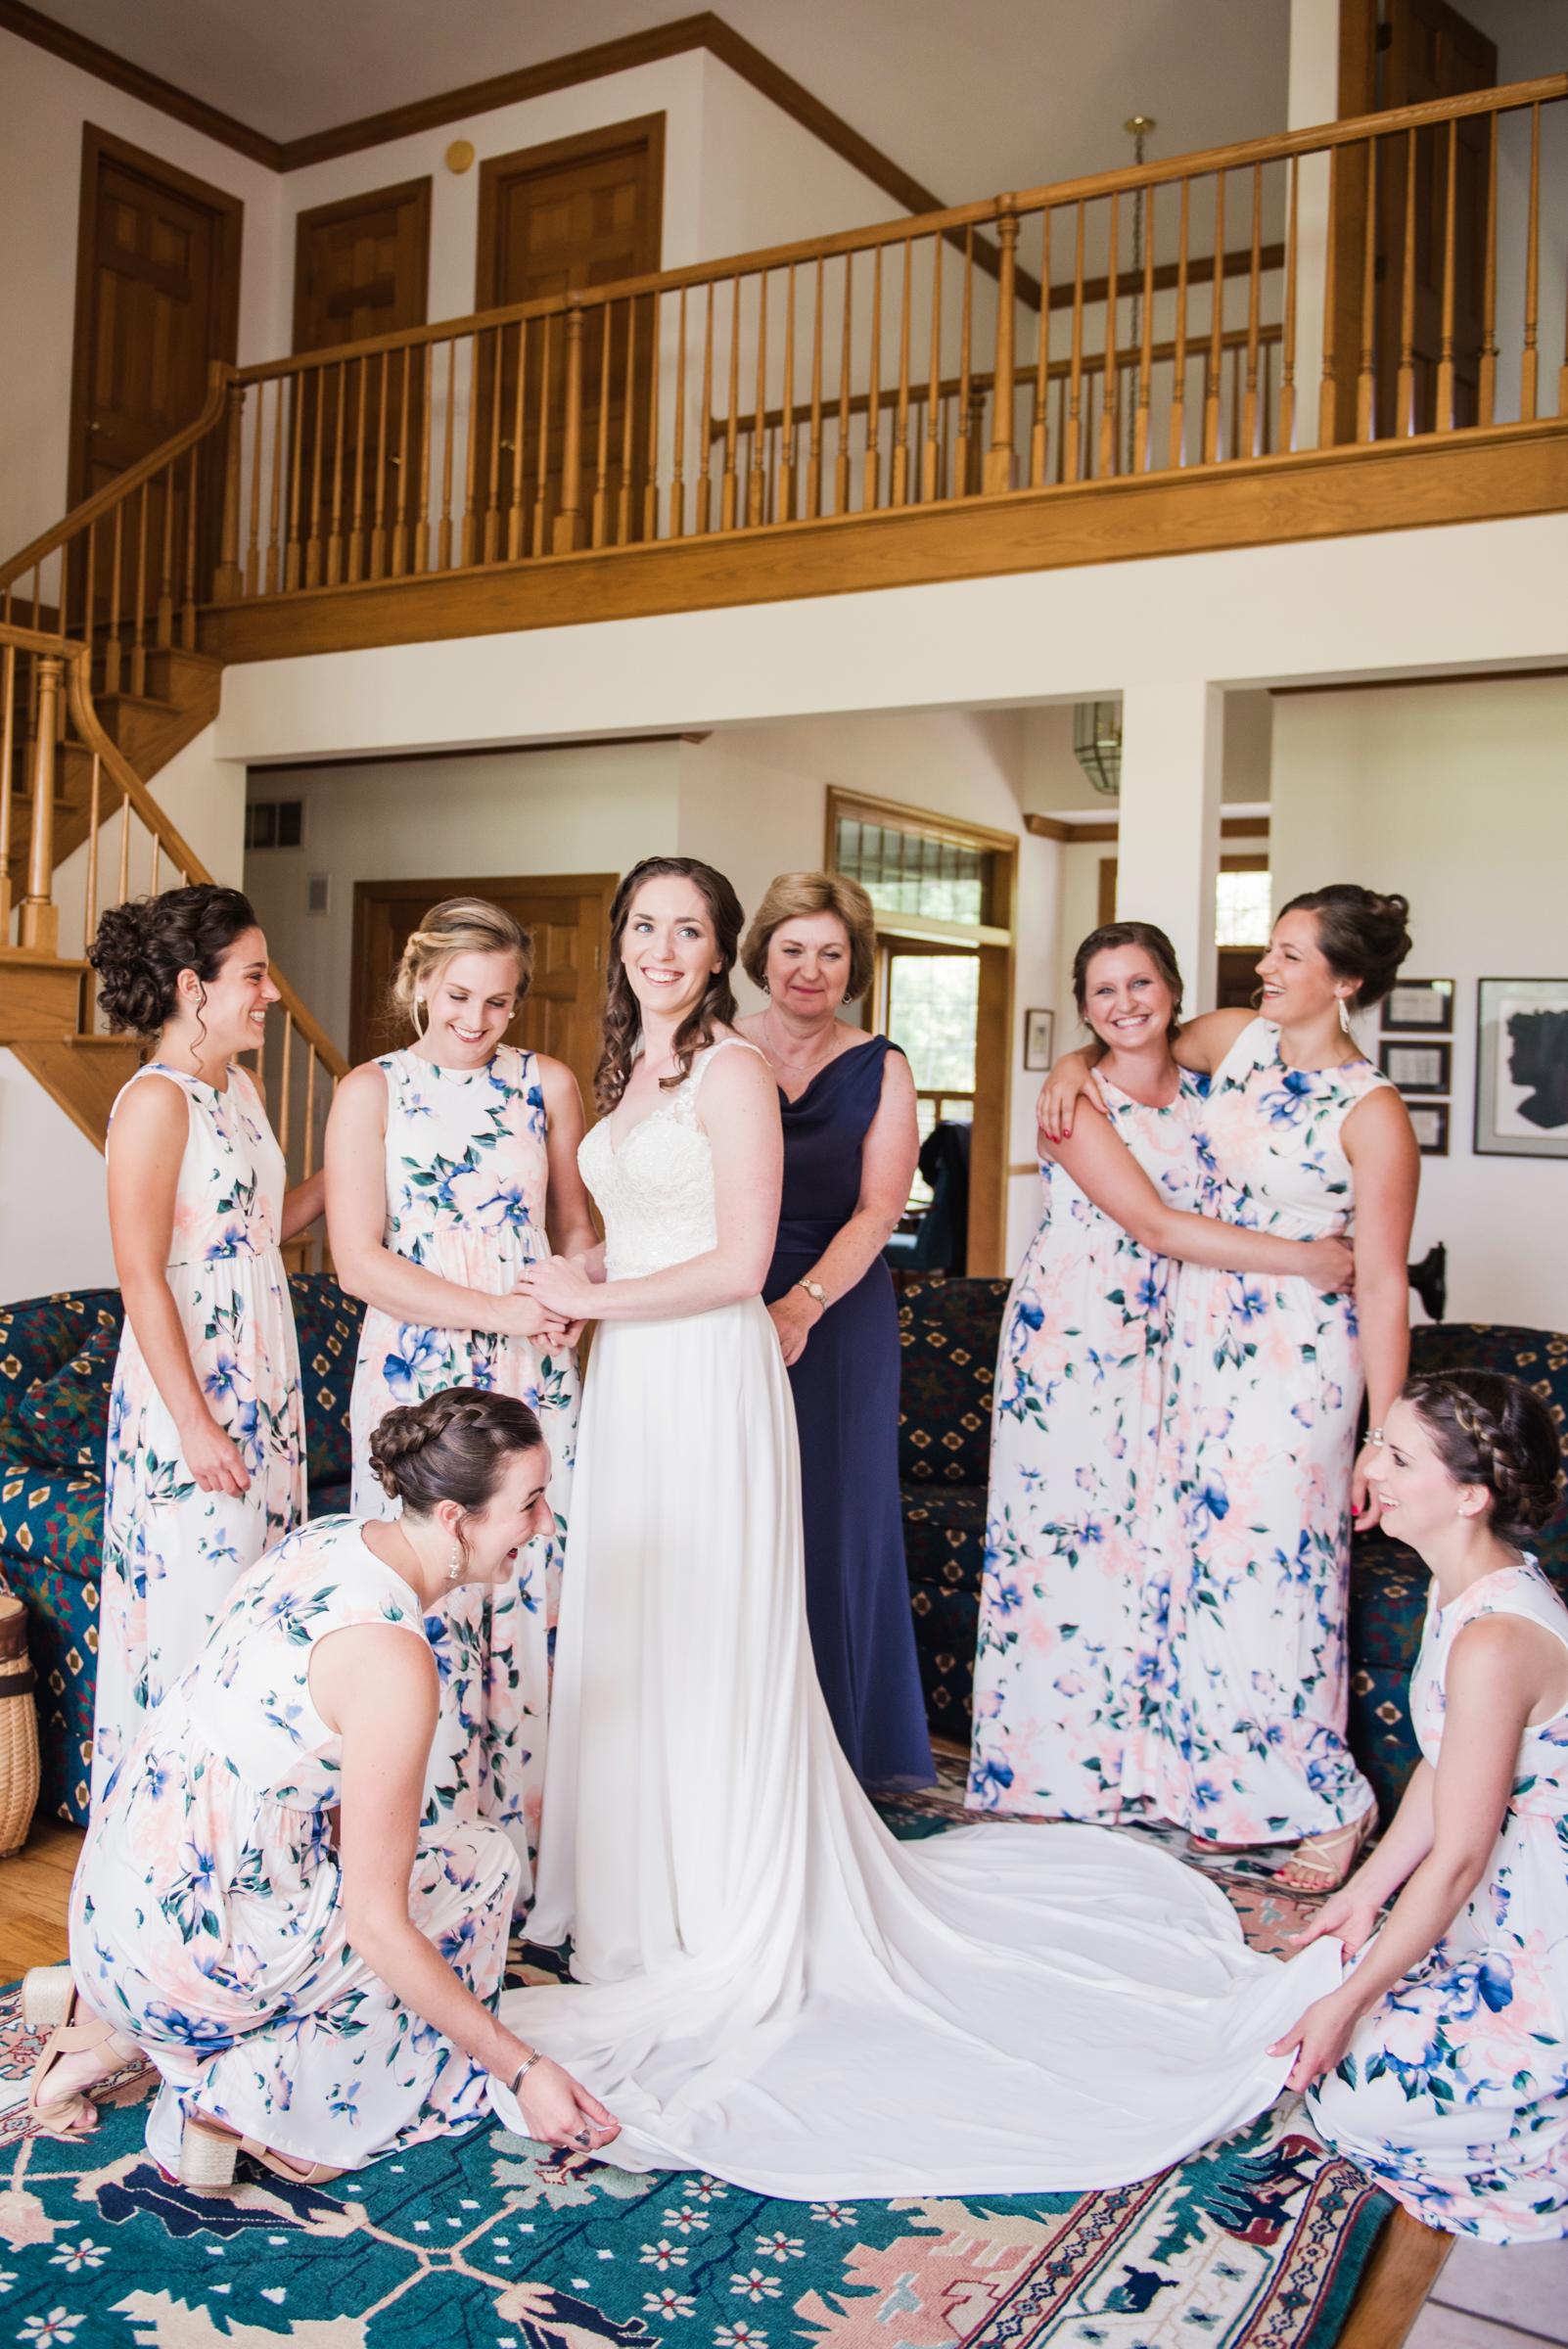 Jerris_Wadsworth_Wedding_Barn_Rochester_Wedding_JILL_STUDIO_Rochester_NY_Photographer_DSC_2201.jpg